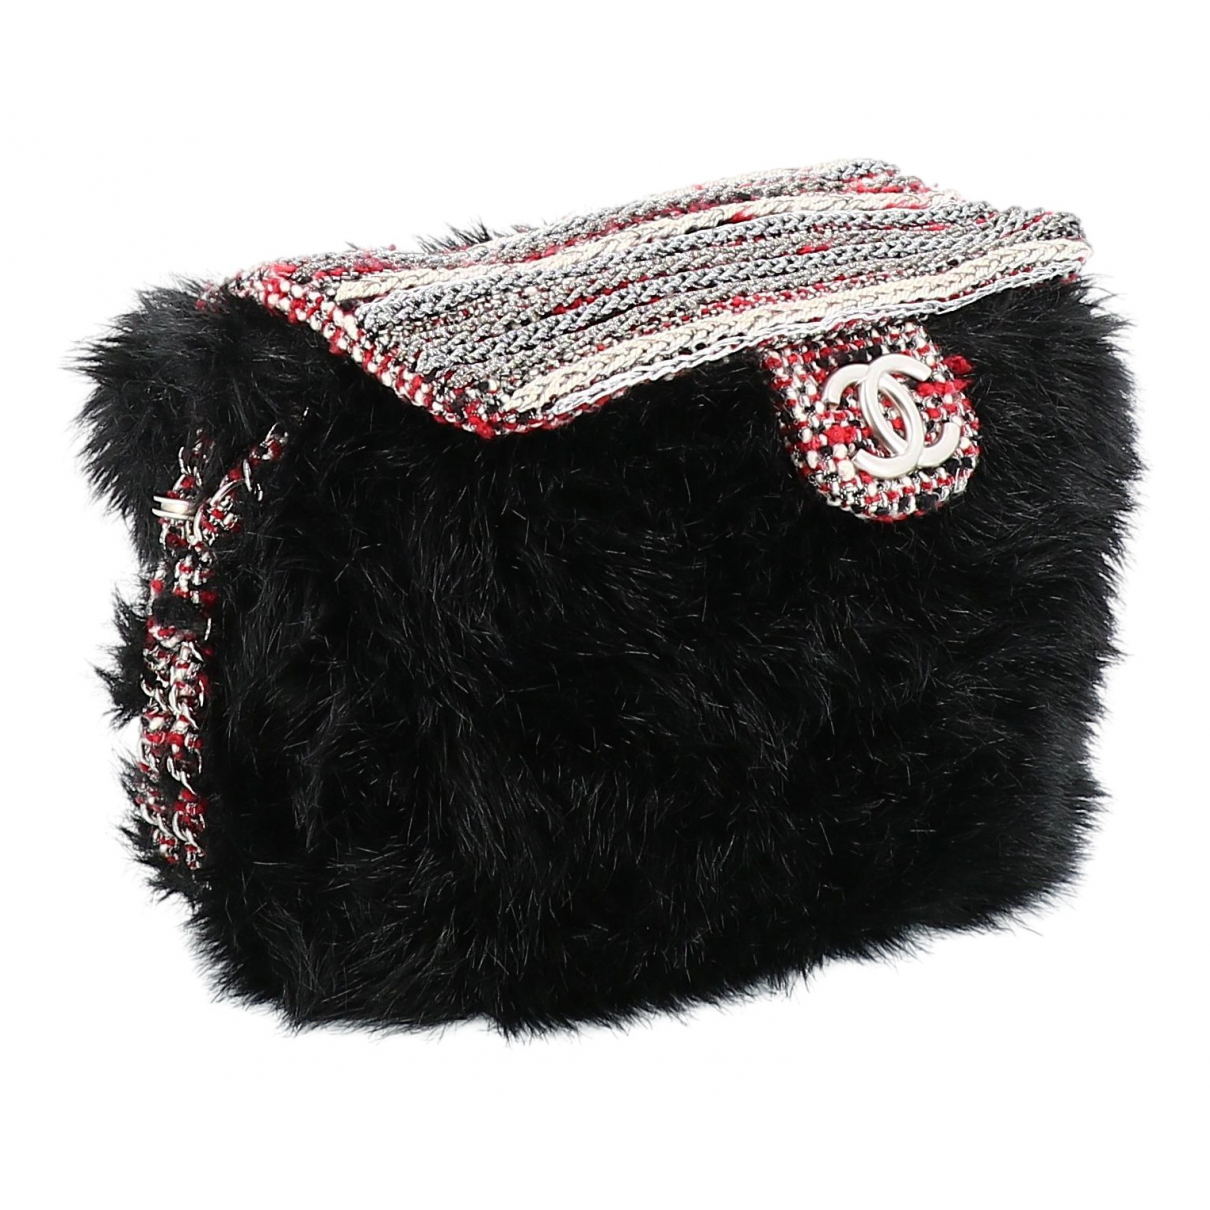 Chanel \N Black Faux fur handbag for Women \N